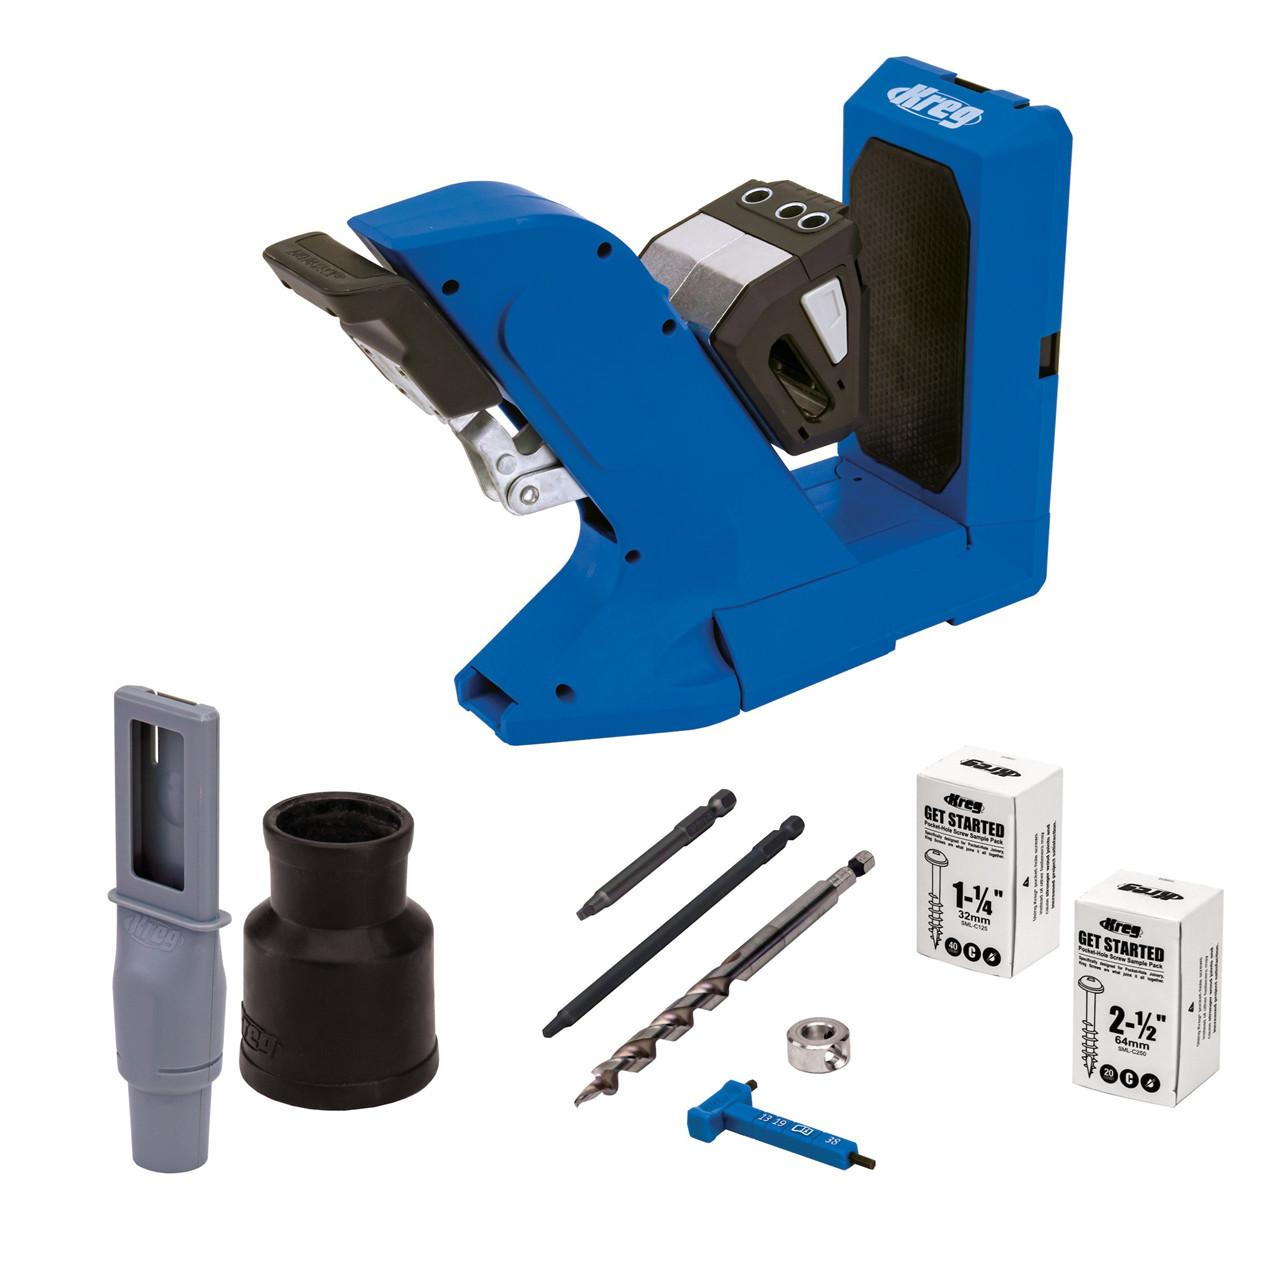 Køb KREG Pocket-Hole Jig 720